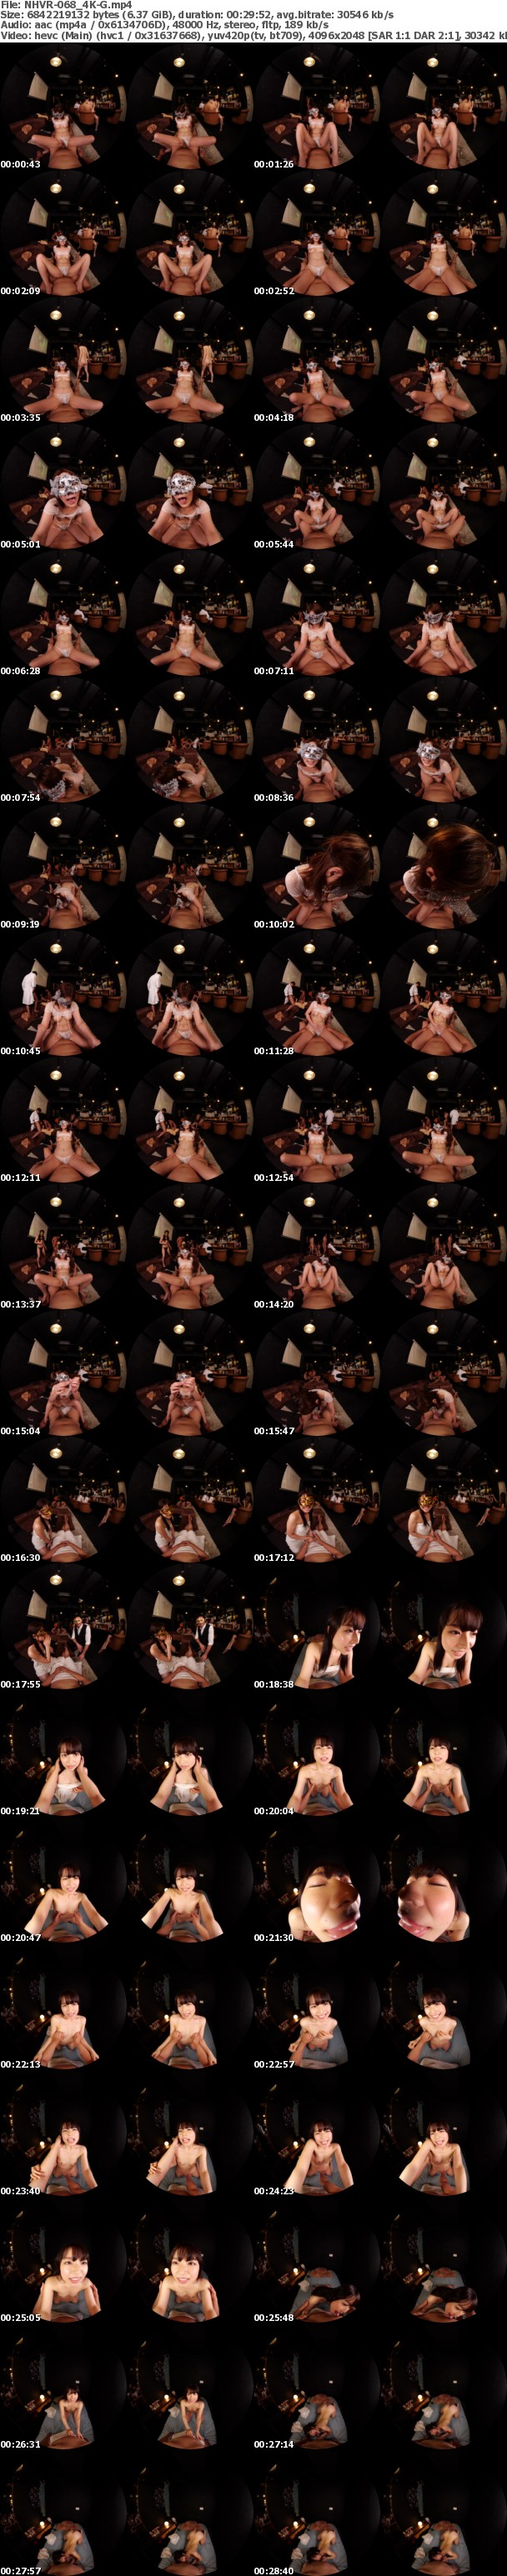 (VR) (4K) NHVR-068 錦糸町B店全面協力!本物店舗で撮影した超リアルハプニングバー体験 VR ~会社の同僚宮沢さんと~